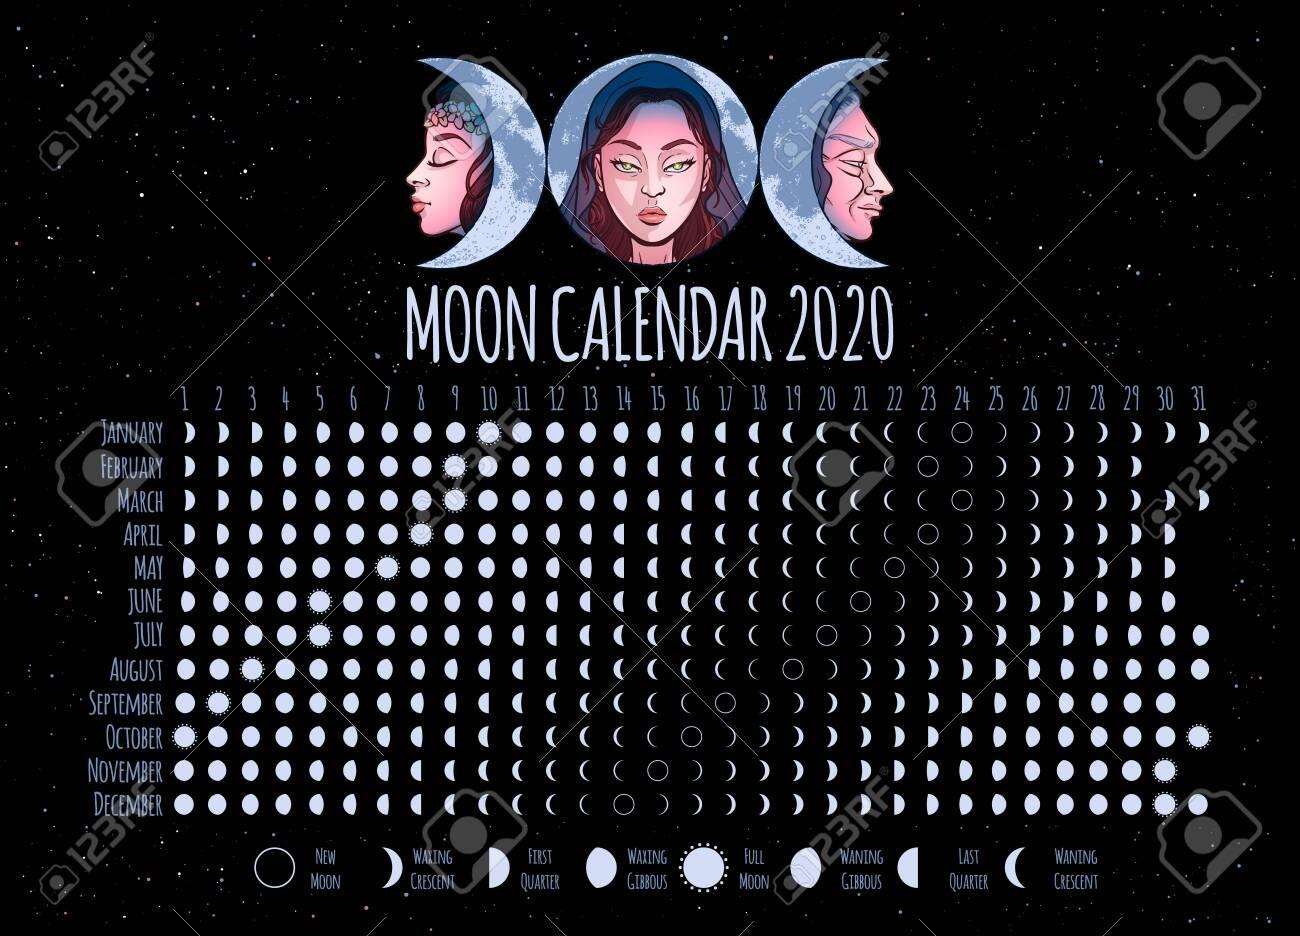 moon phase calendar 2020